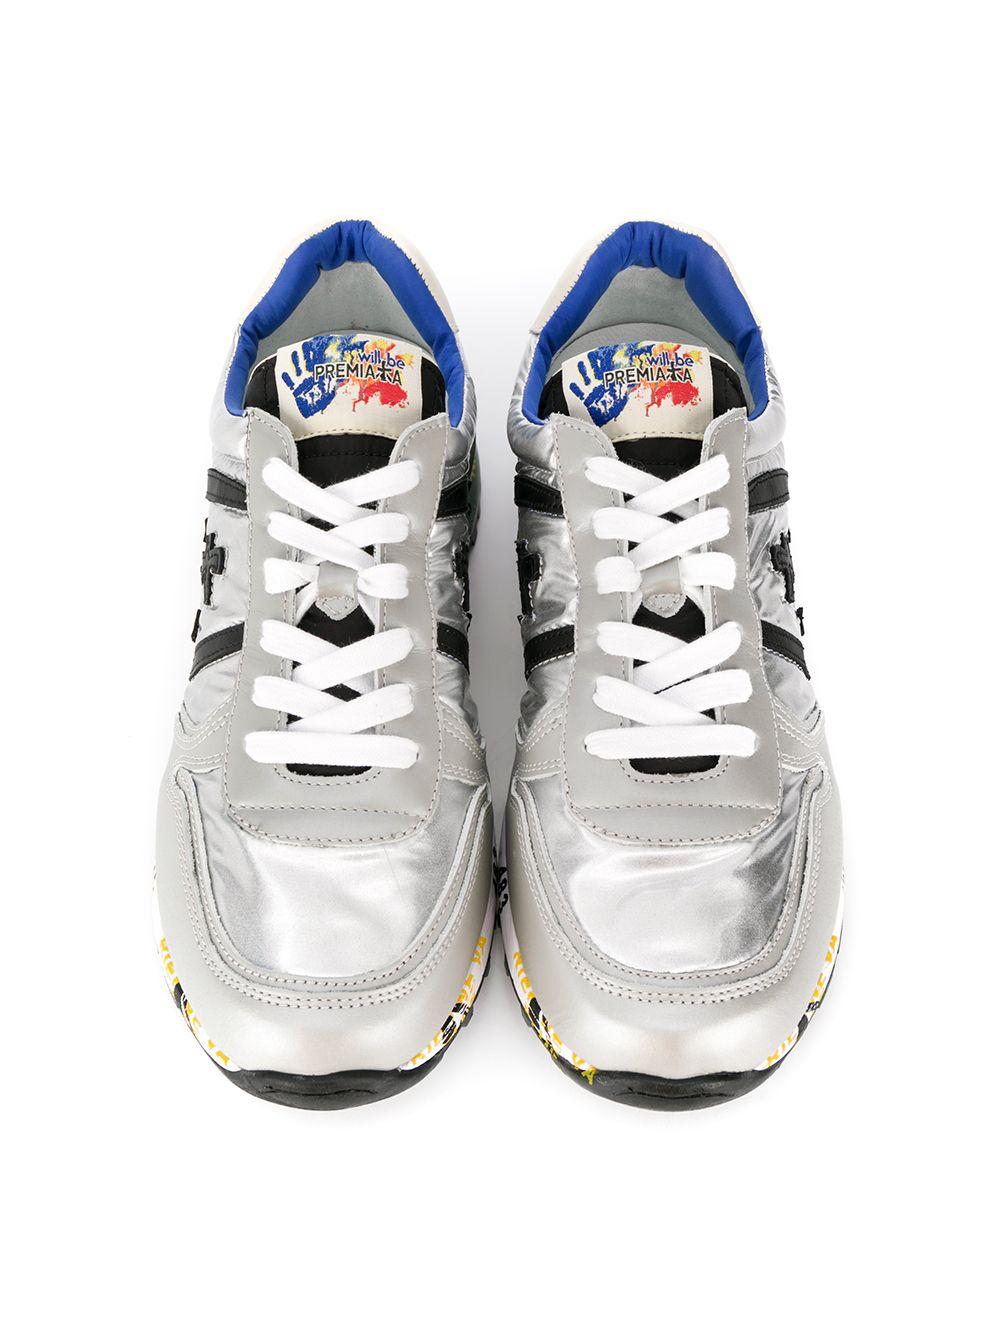 Premiata Kids | кроссовки с эффектом металлик | Clouty